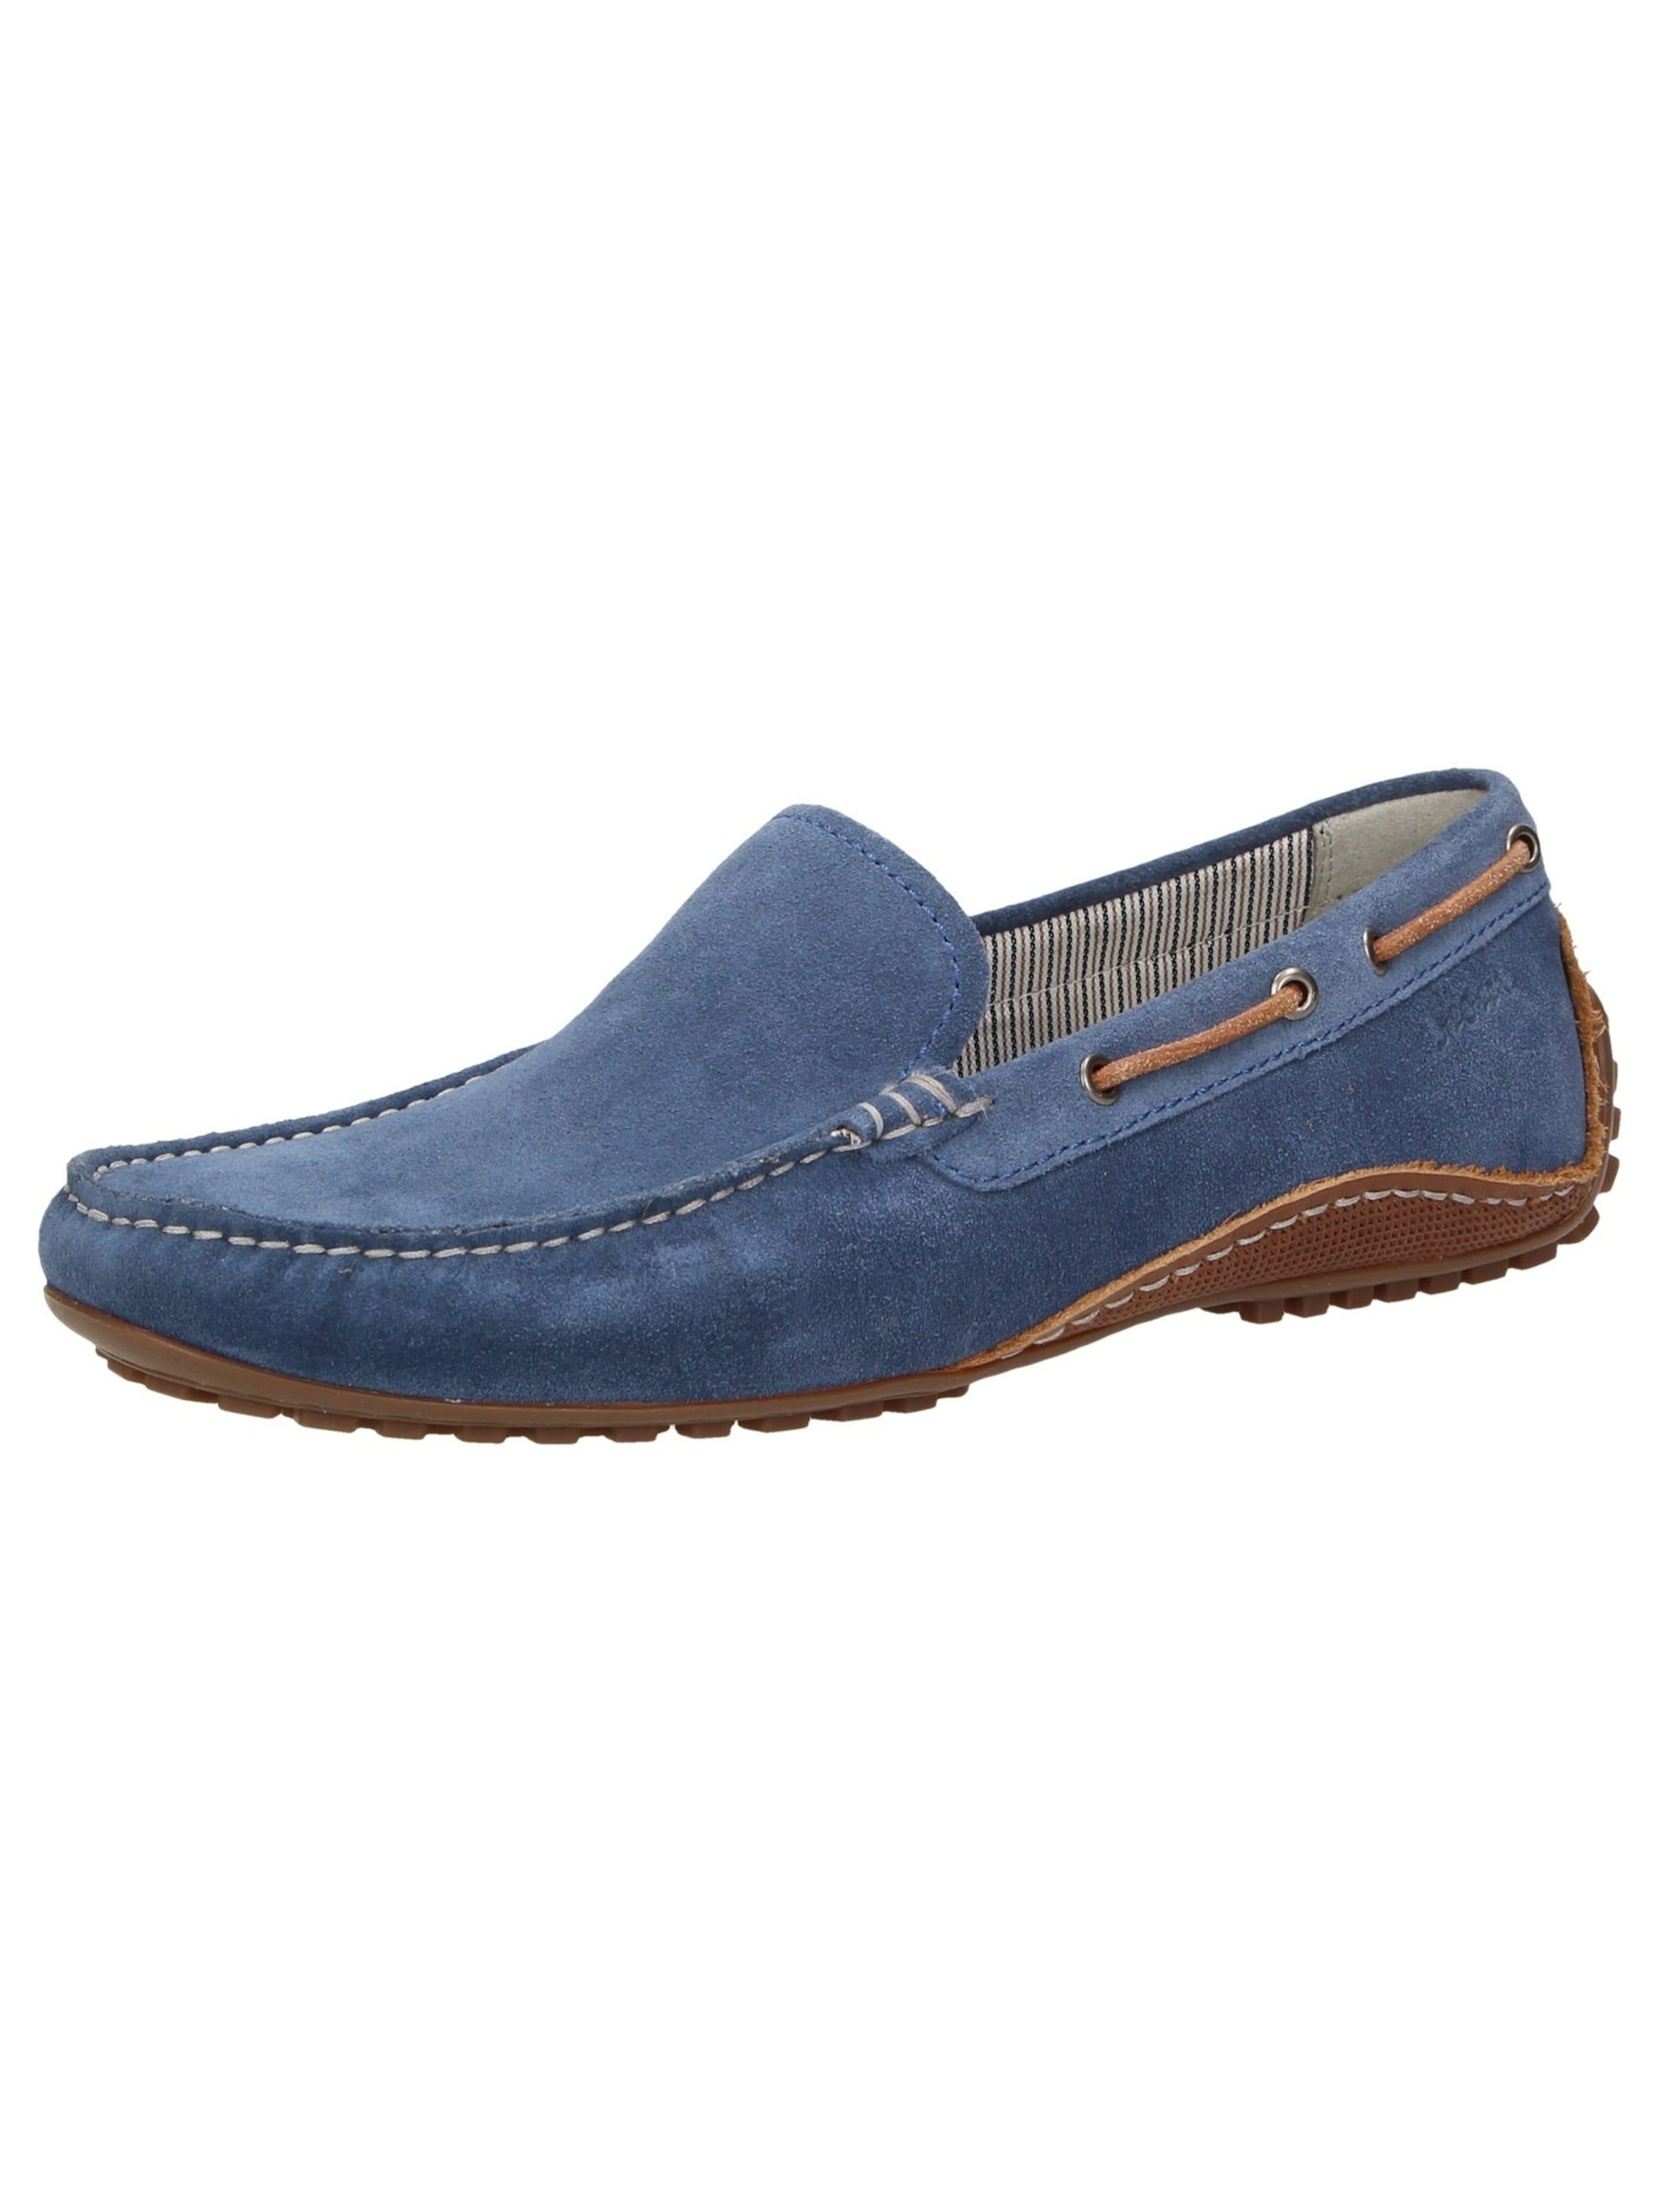 Haltbare Mode billige Schuhe SIOUX | Slipper 'Callimo' Schuhe Gut getragene Schuhe